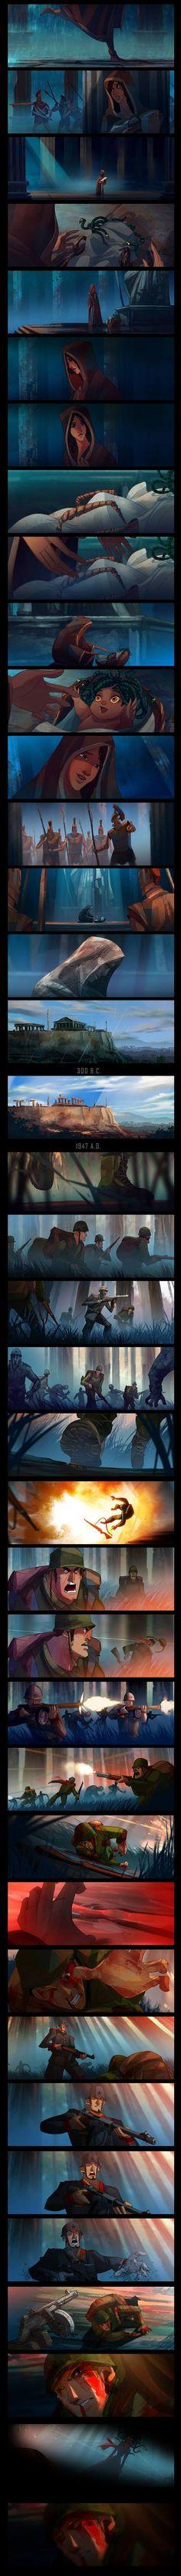 Awesome short story fromJUN CHIU Illustration - Album on Imgur